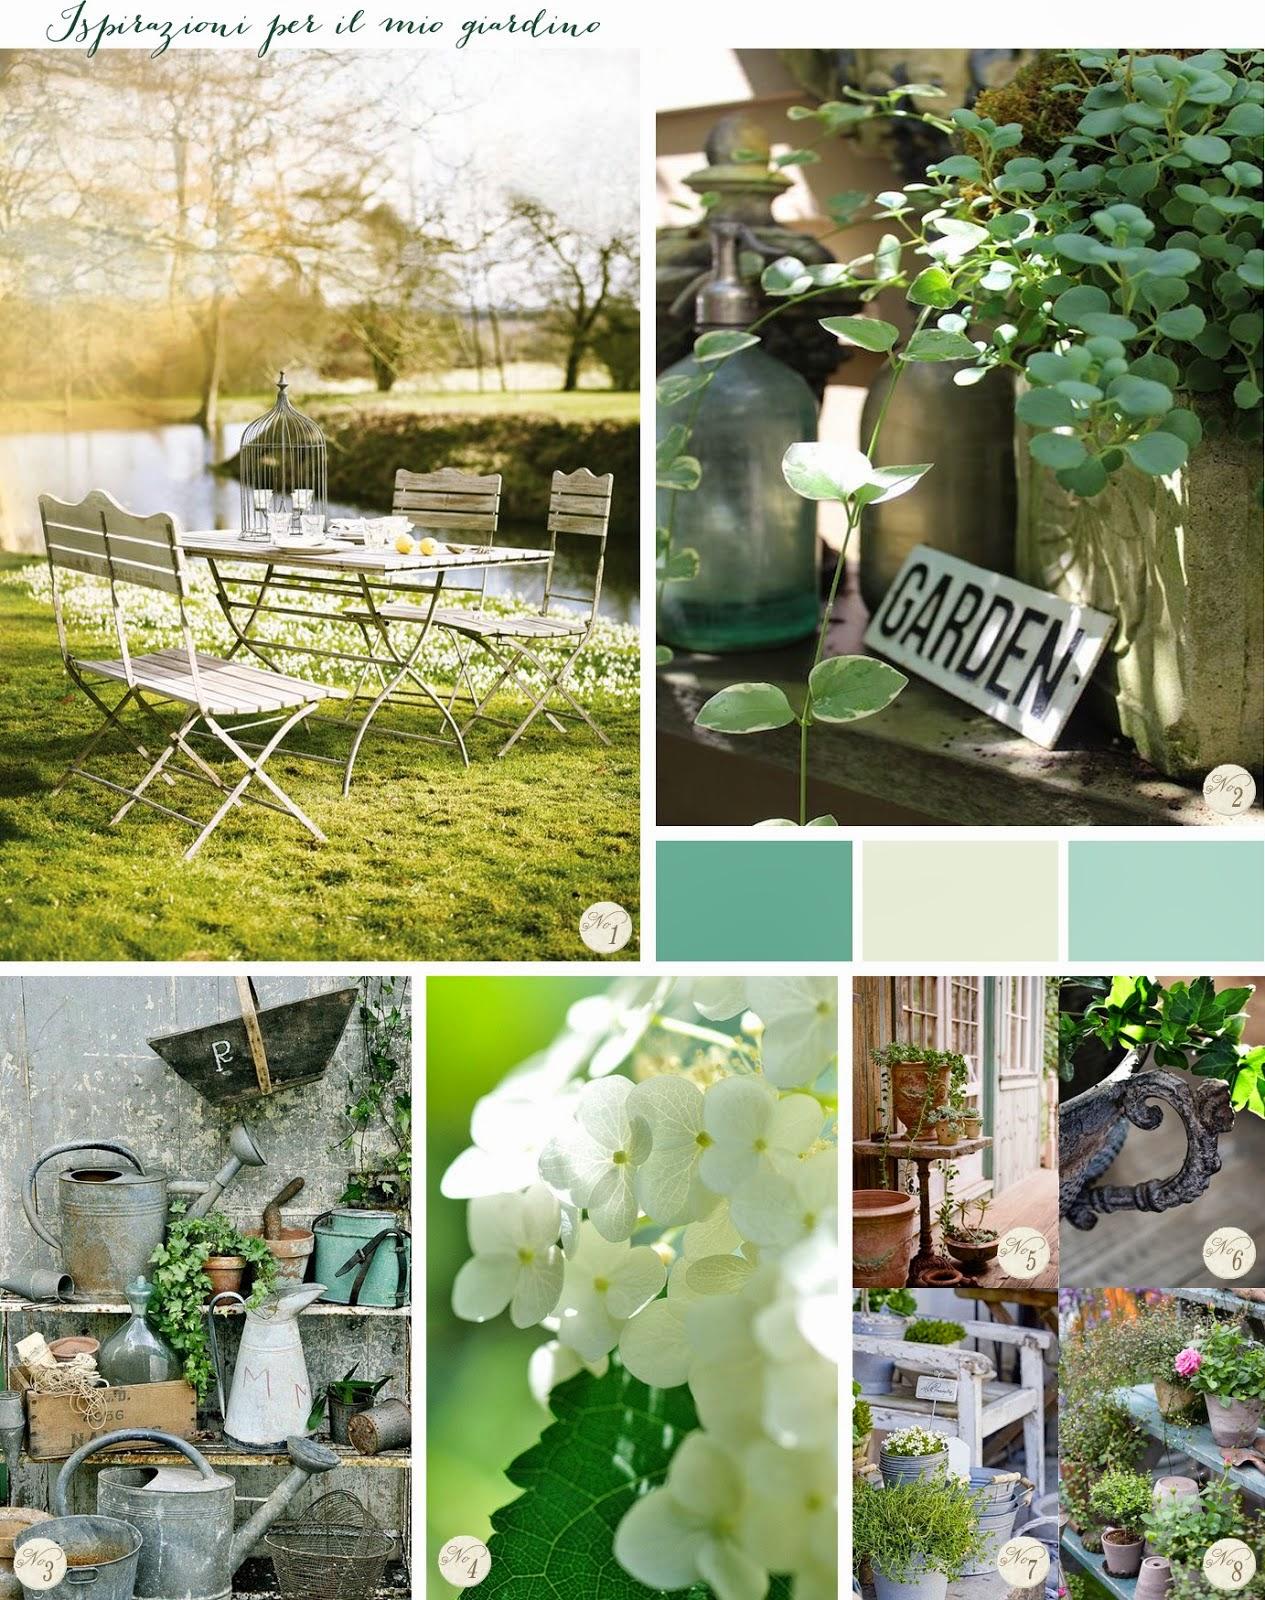 Jardin shabby shabby chic garden decoration img img for Le style shabby chic